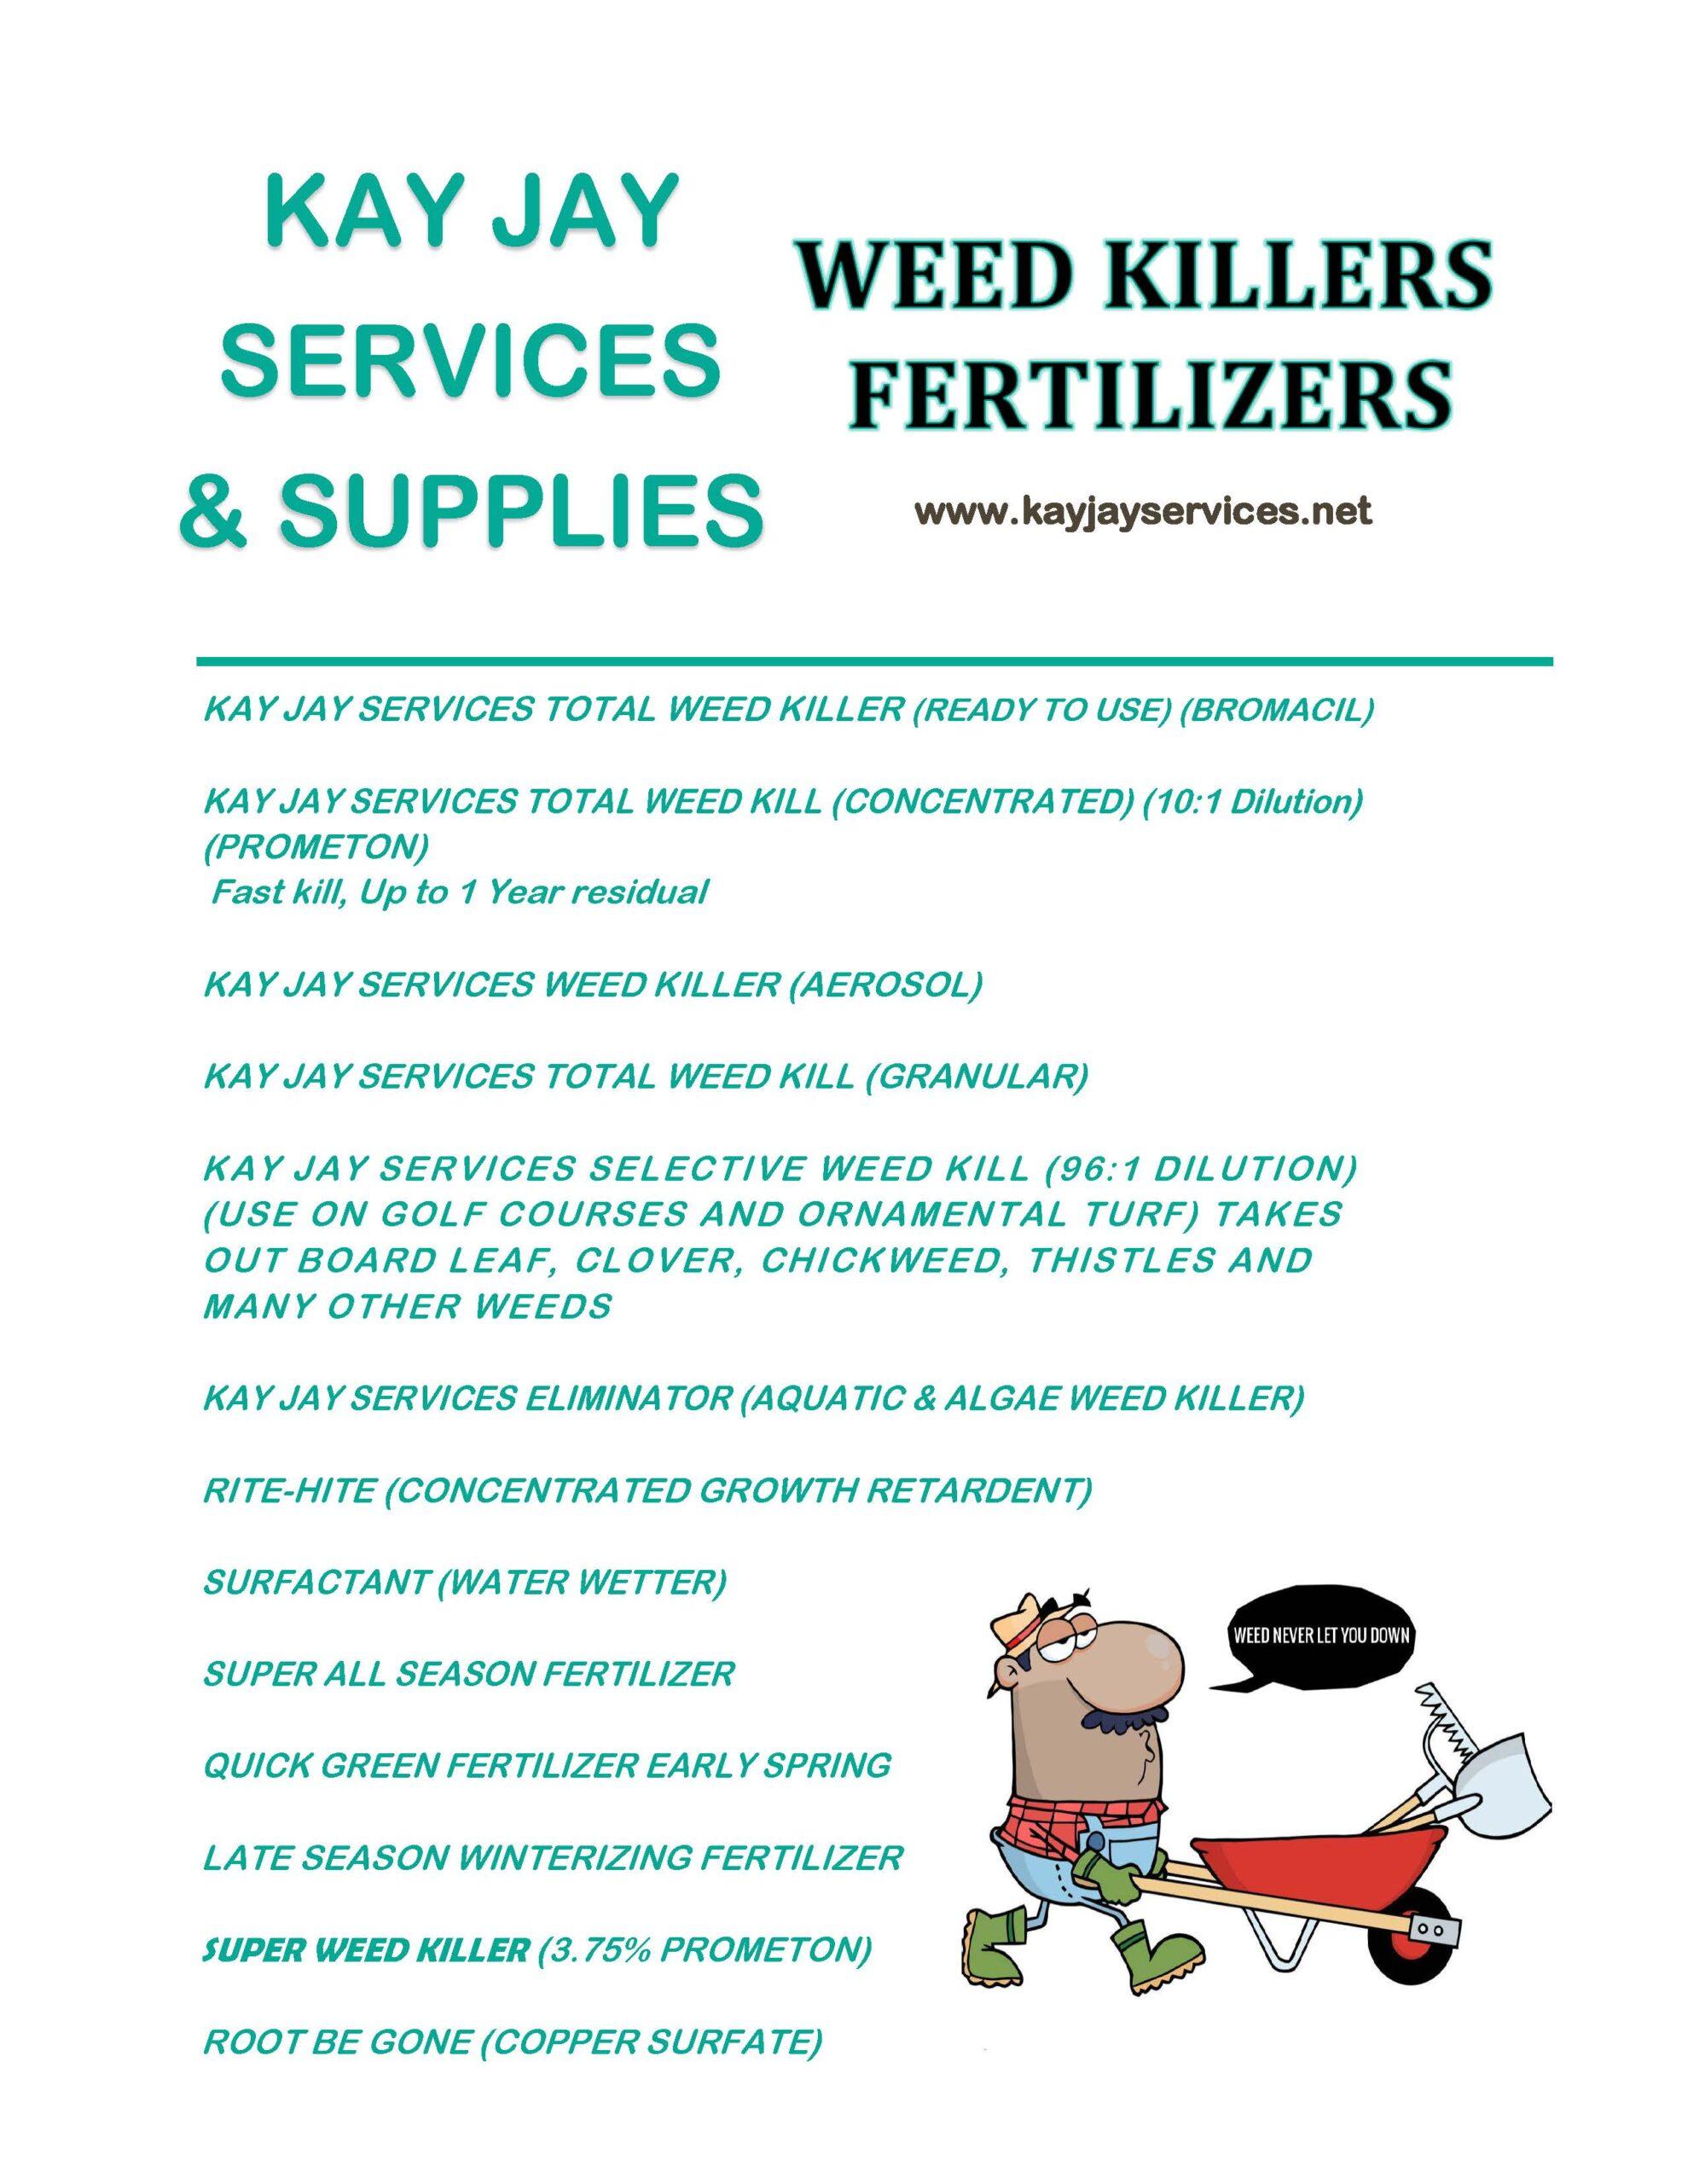 Weed Killers/Fertilizers Flyer